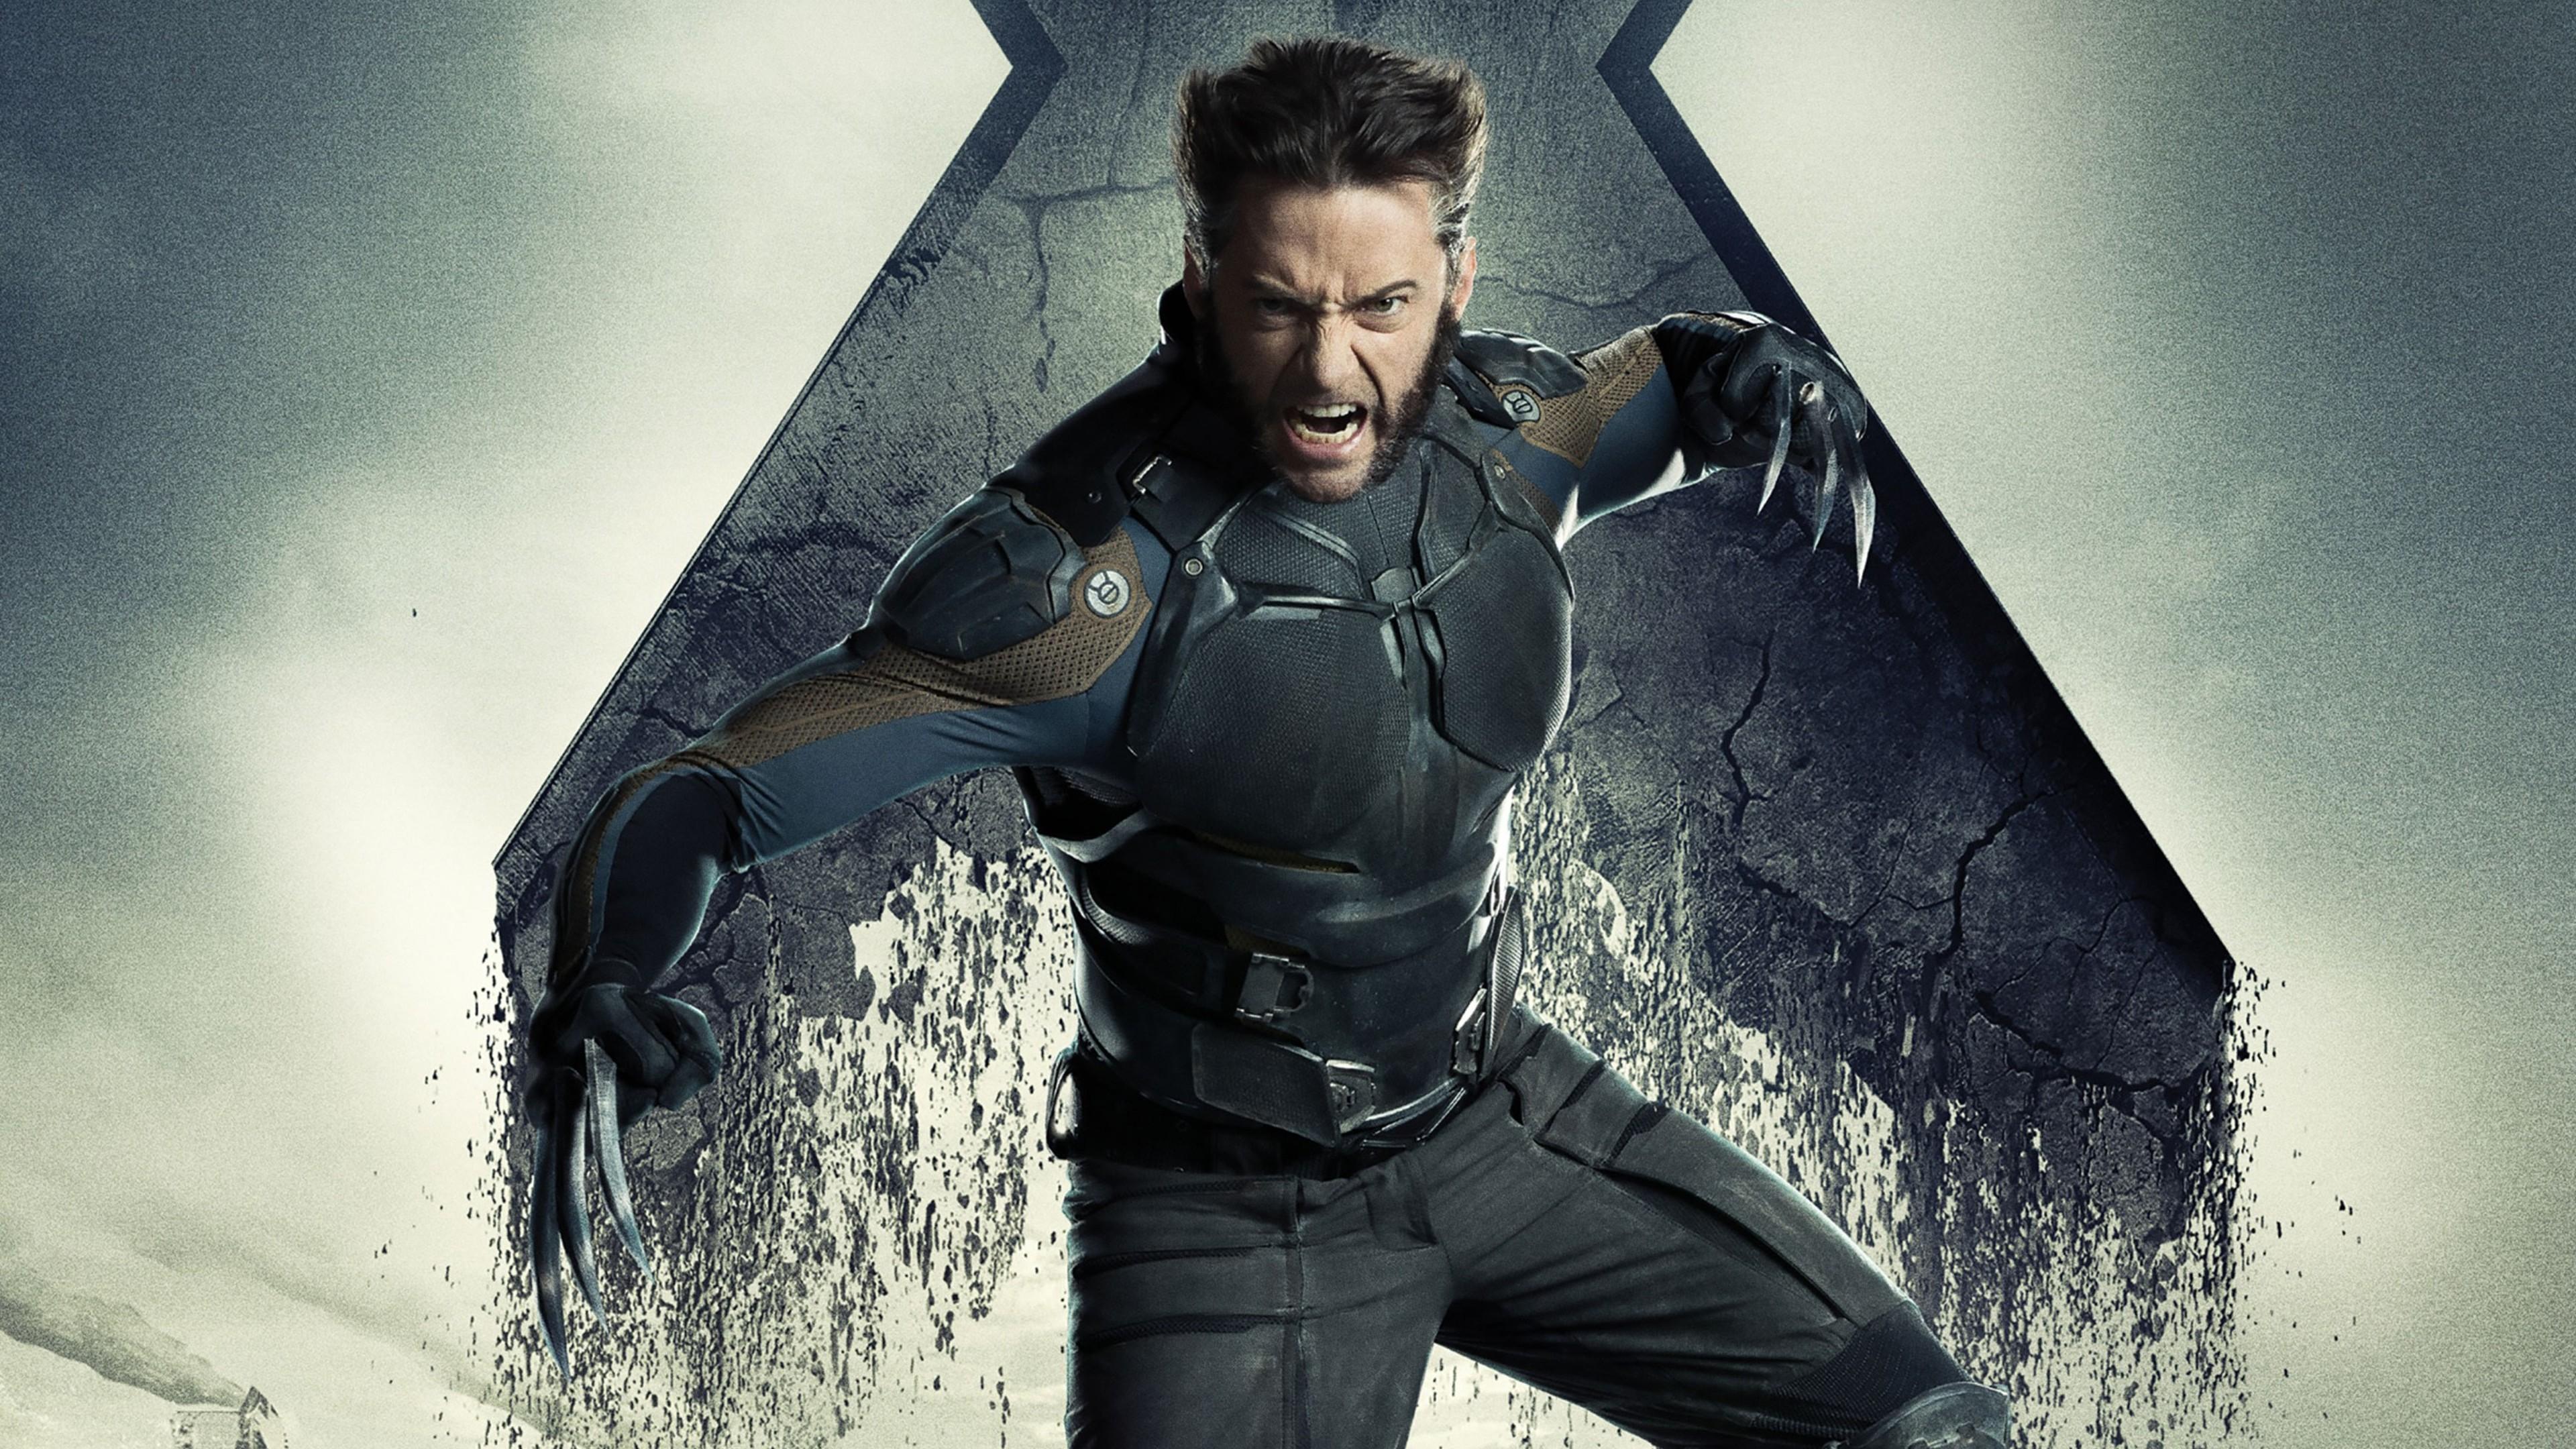 Wallpaper 4k Hugh Jackman X Men Days Of Future Past Movies